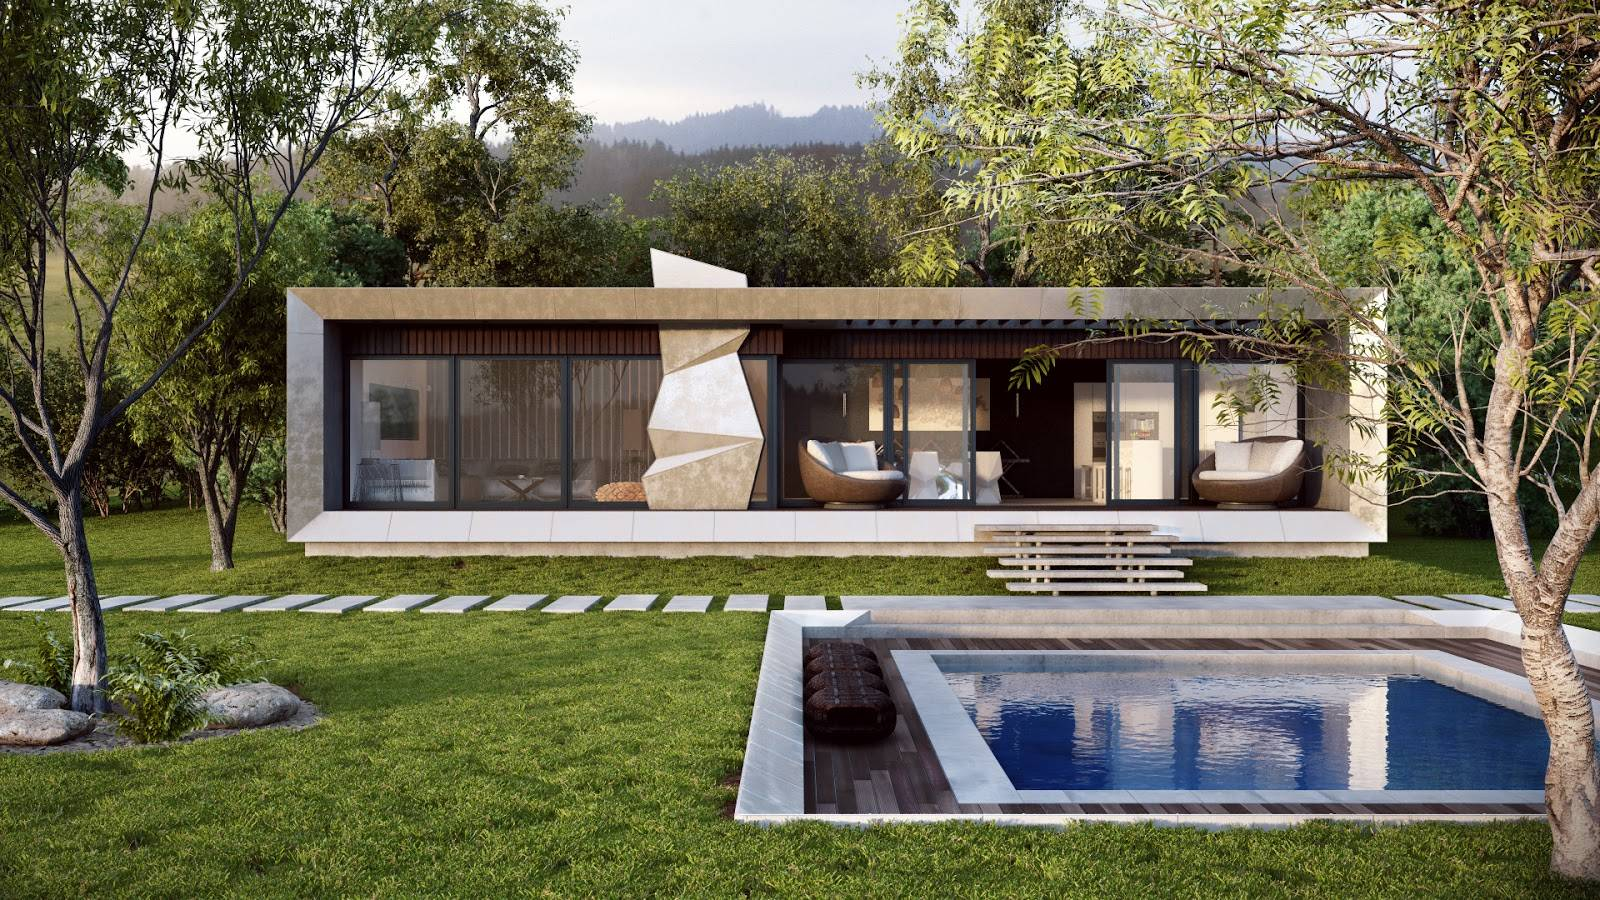 Modern Country Home Interior Design Ideas House Plans 88789